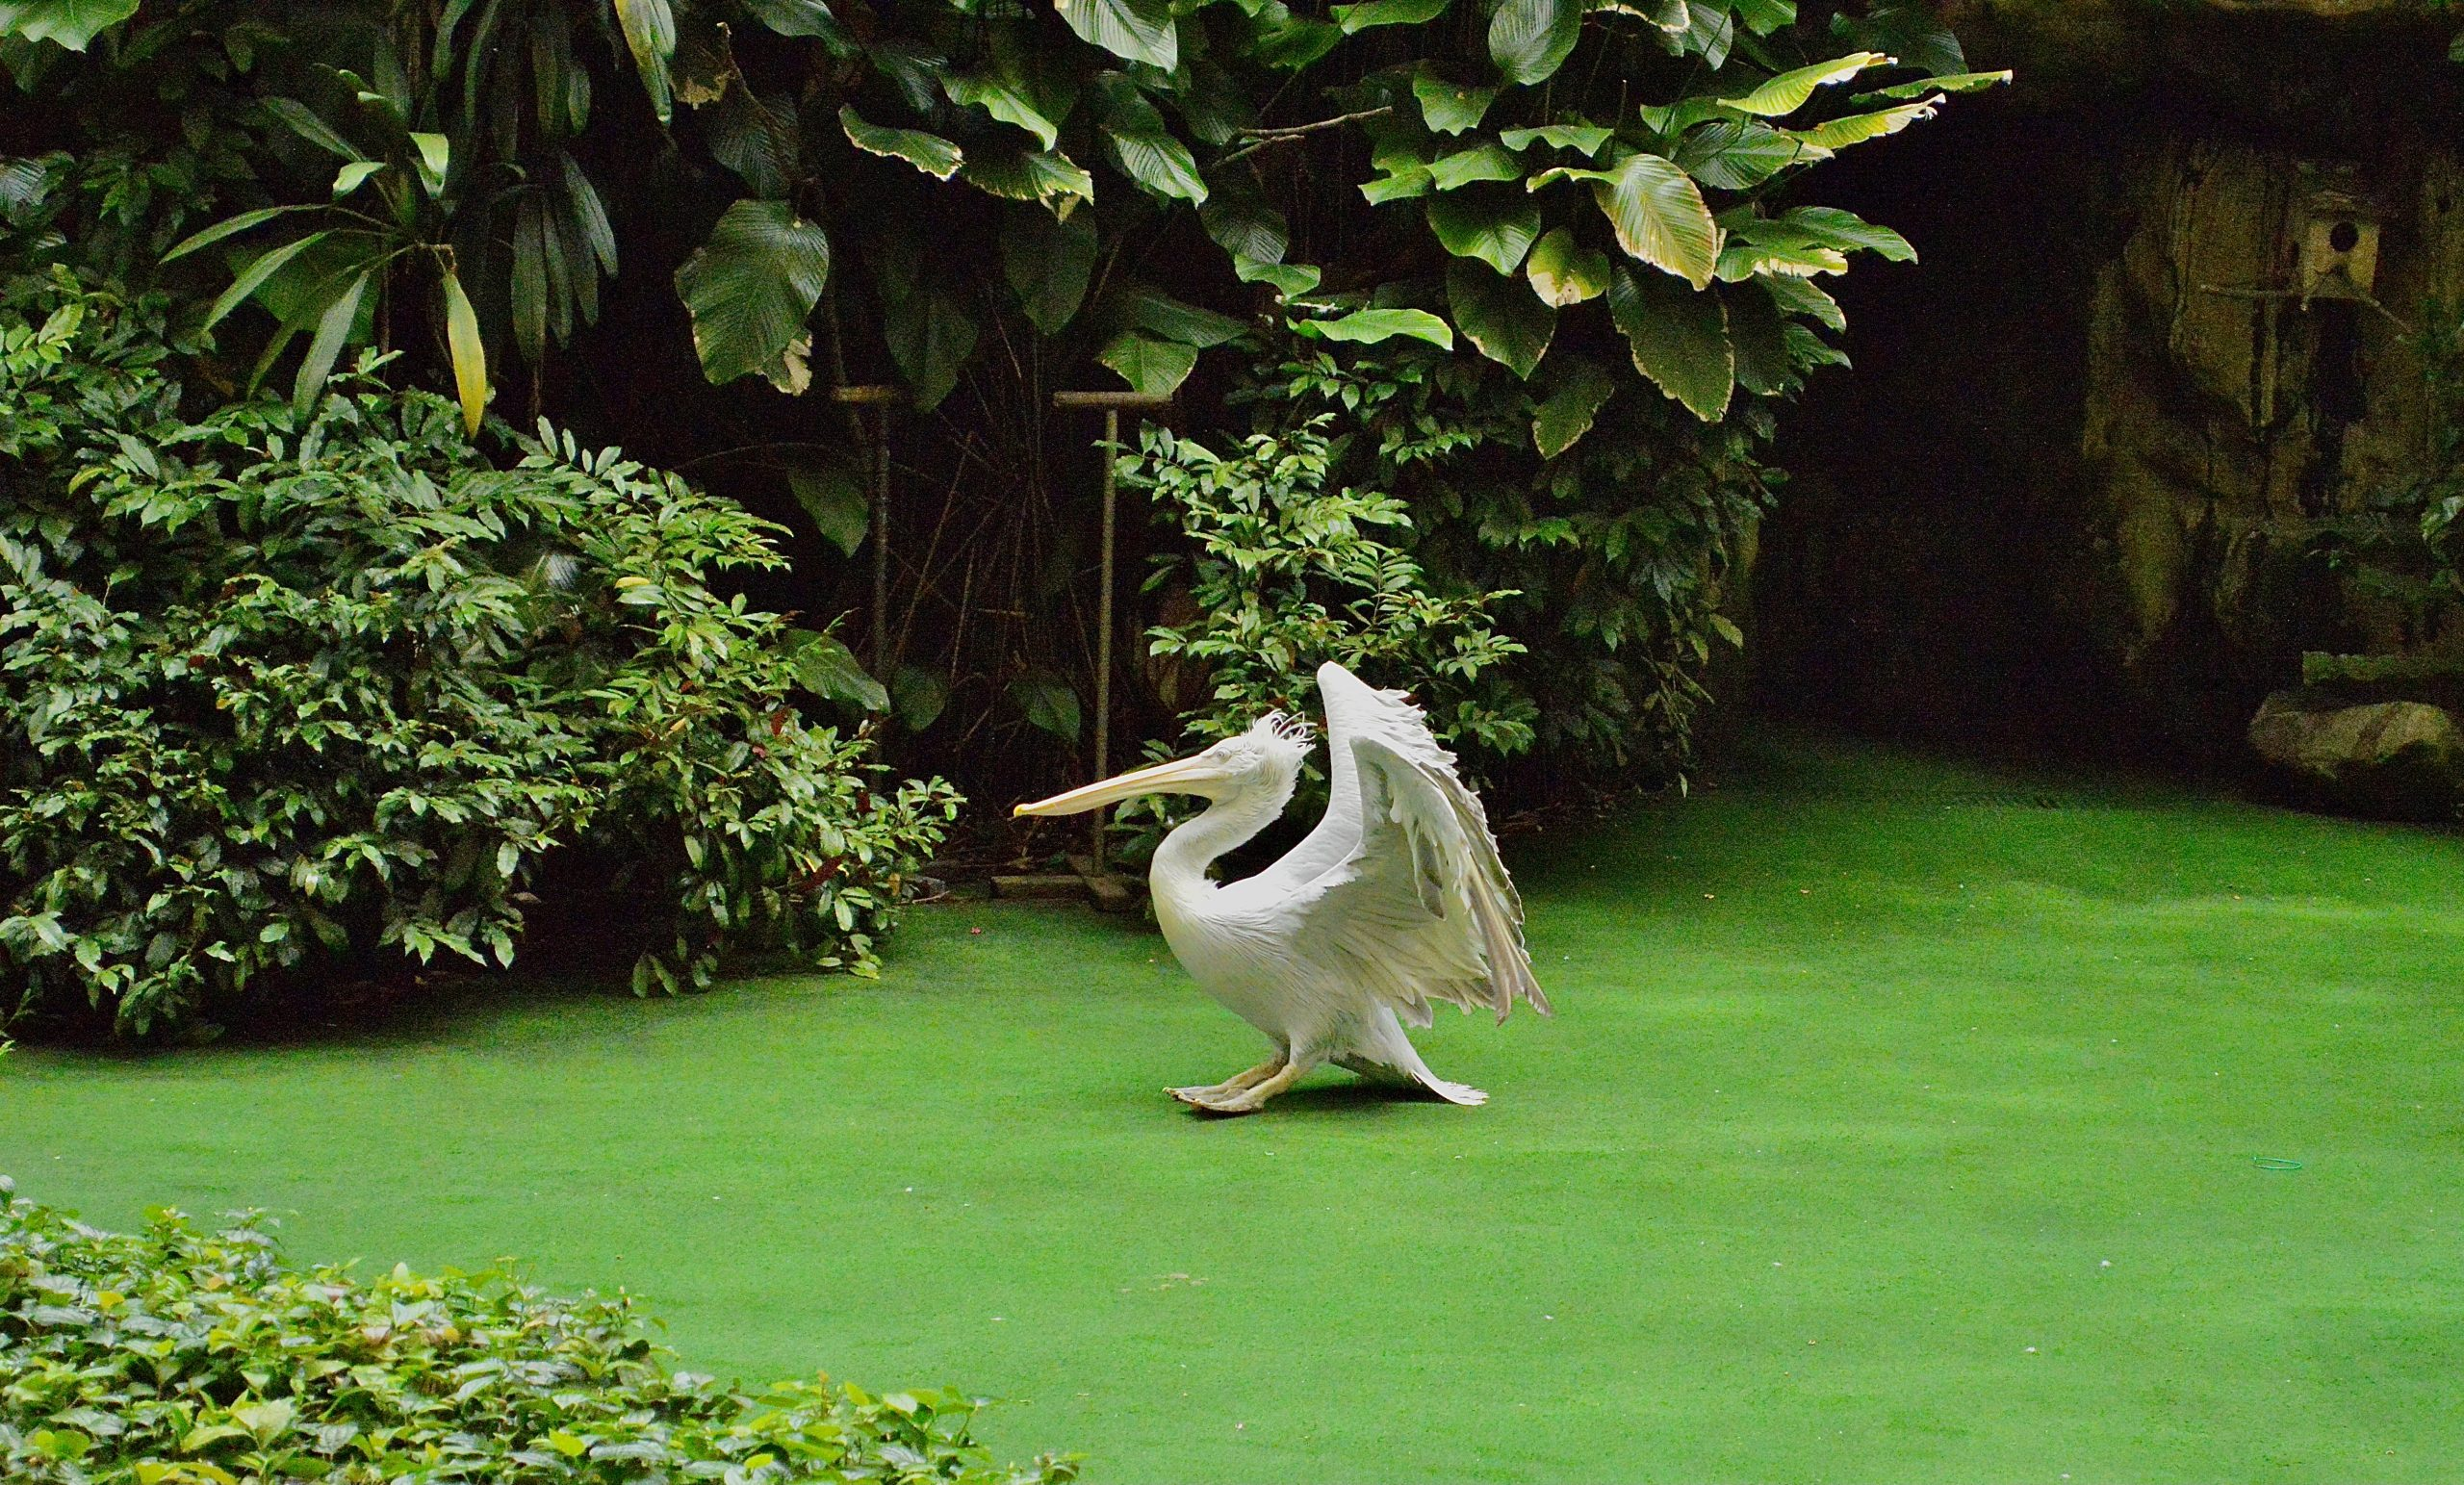 White pelican bird